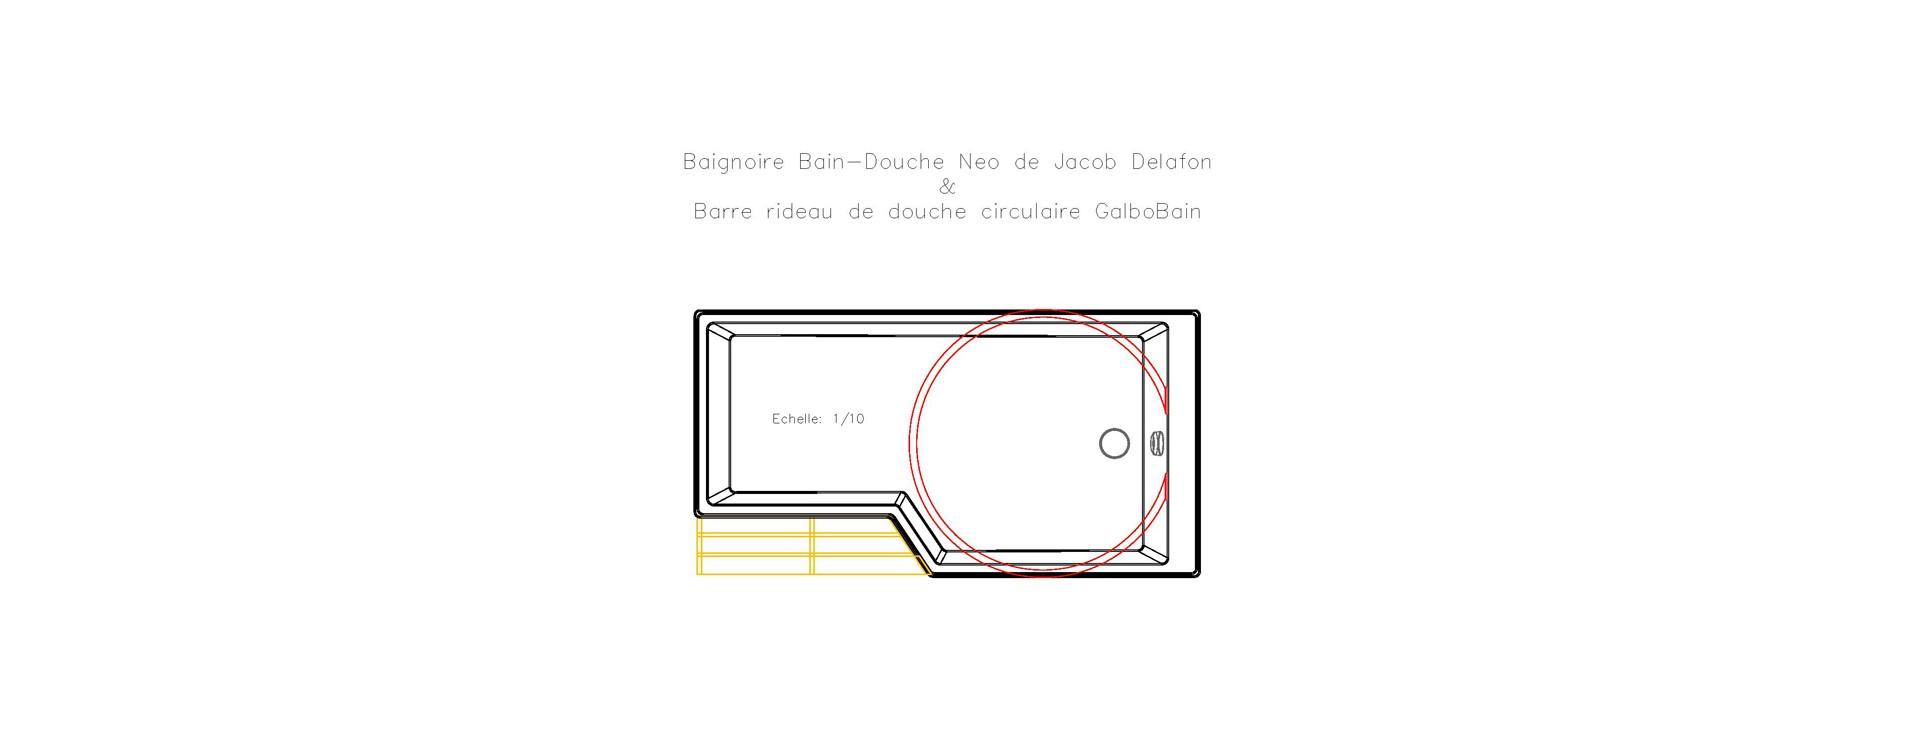 Baignoire Neo De Jacob Delafon Et Barre Circulaire Galbobain